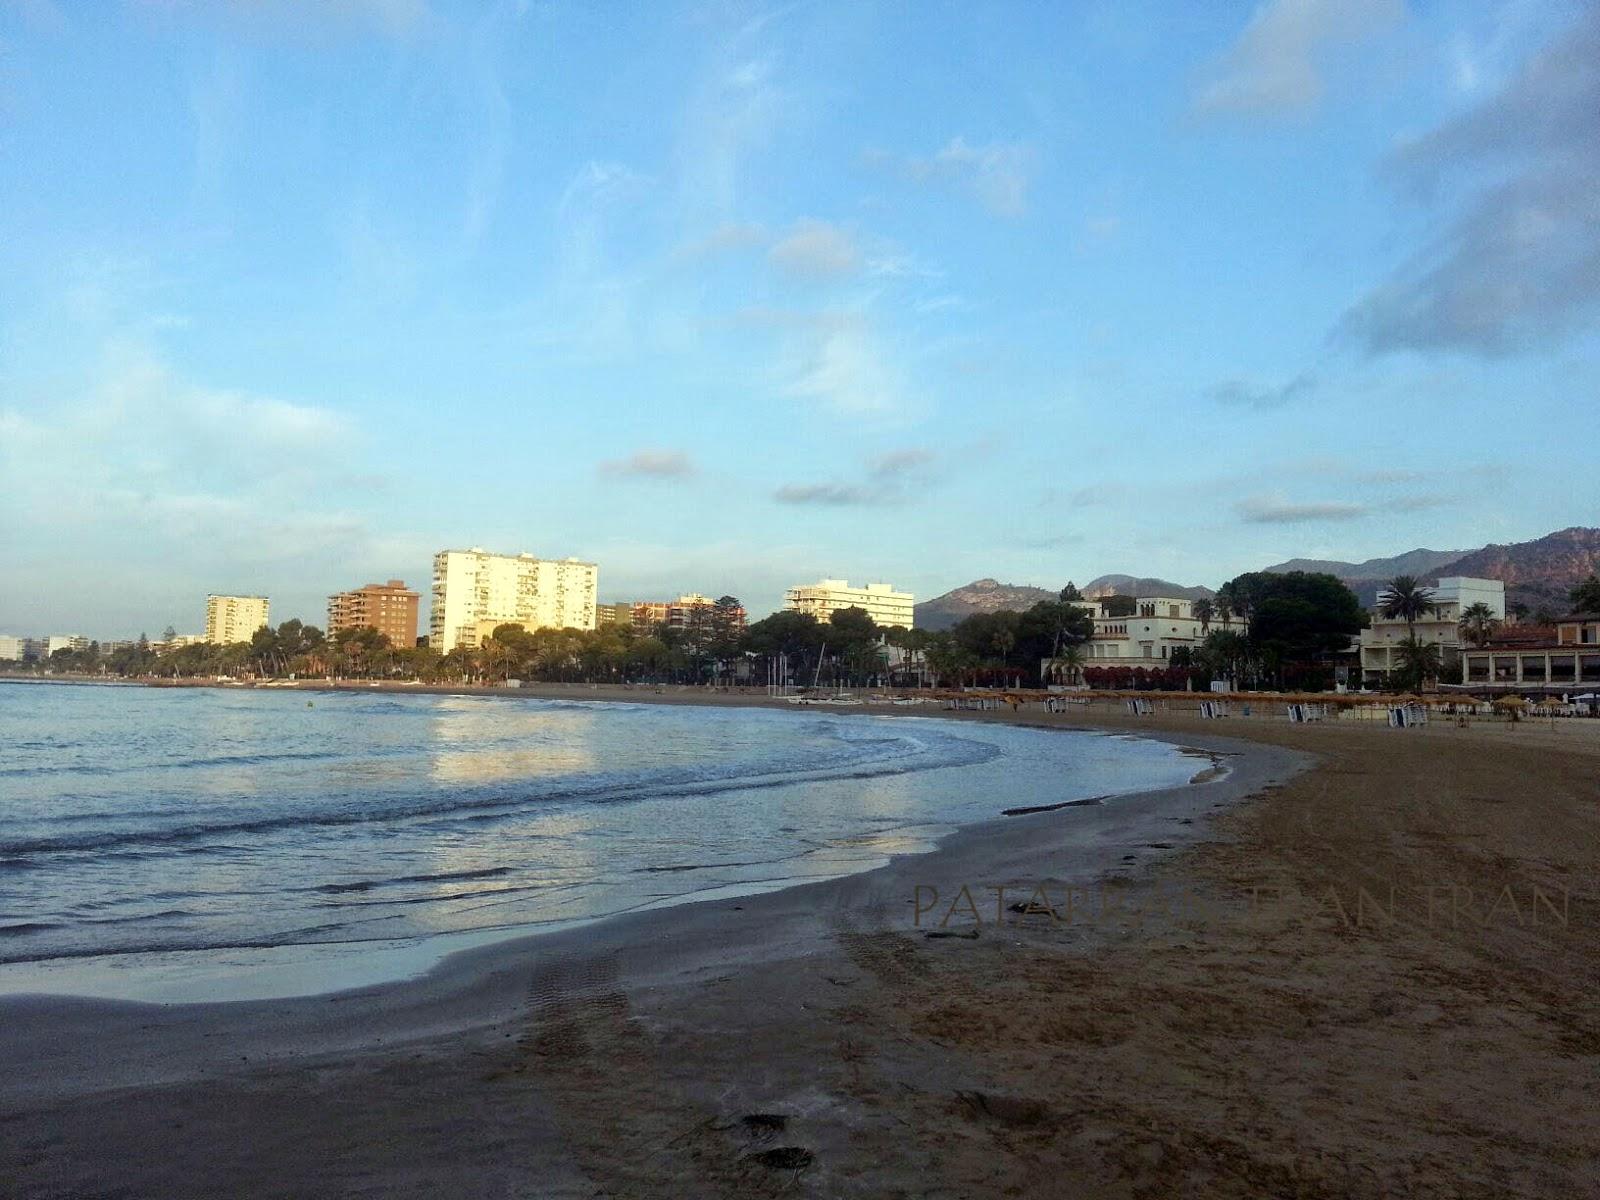 amanecer Playa Voramar. Blessed Summer. Benicassim.